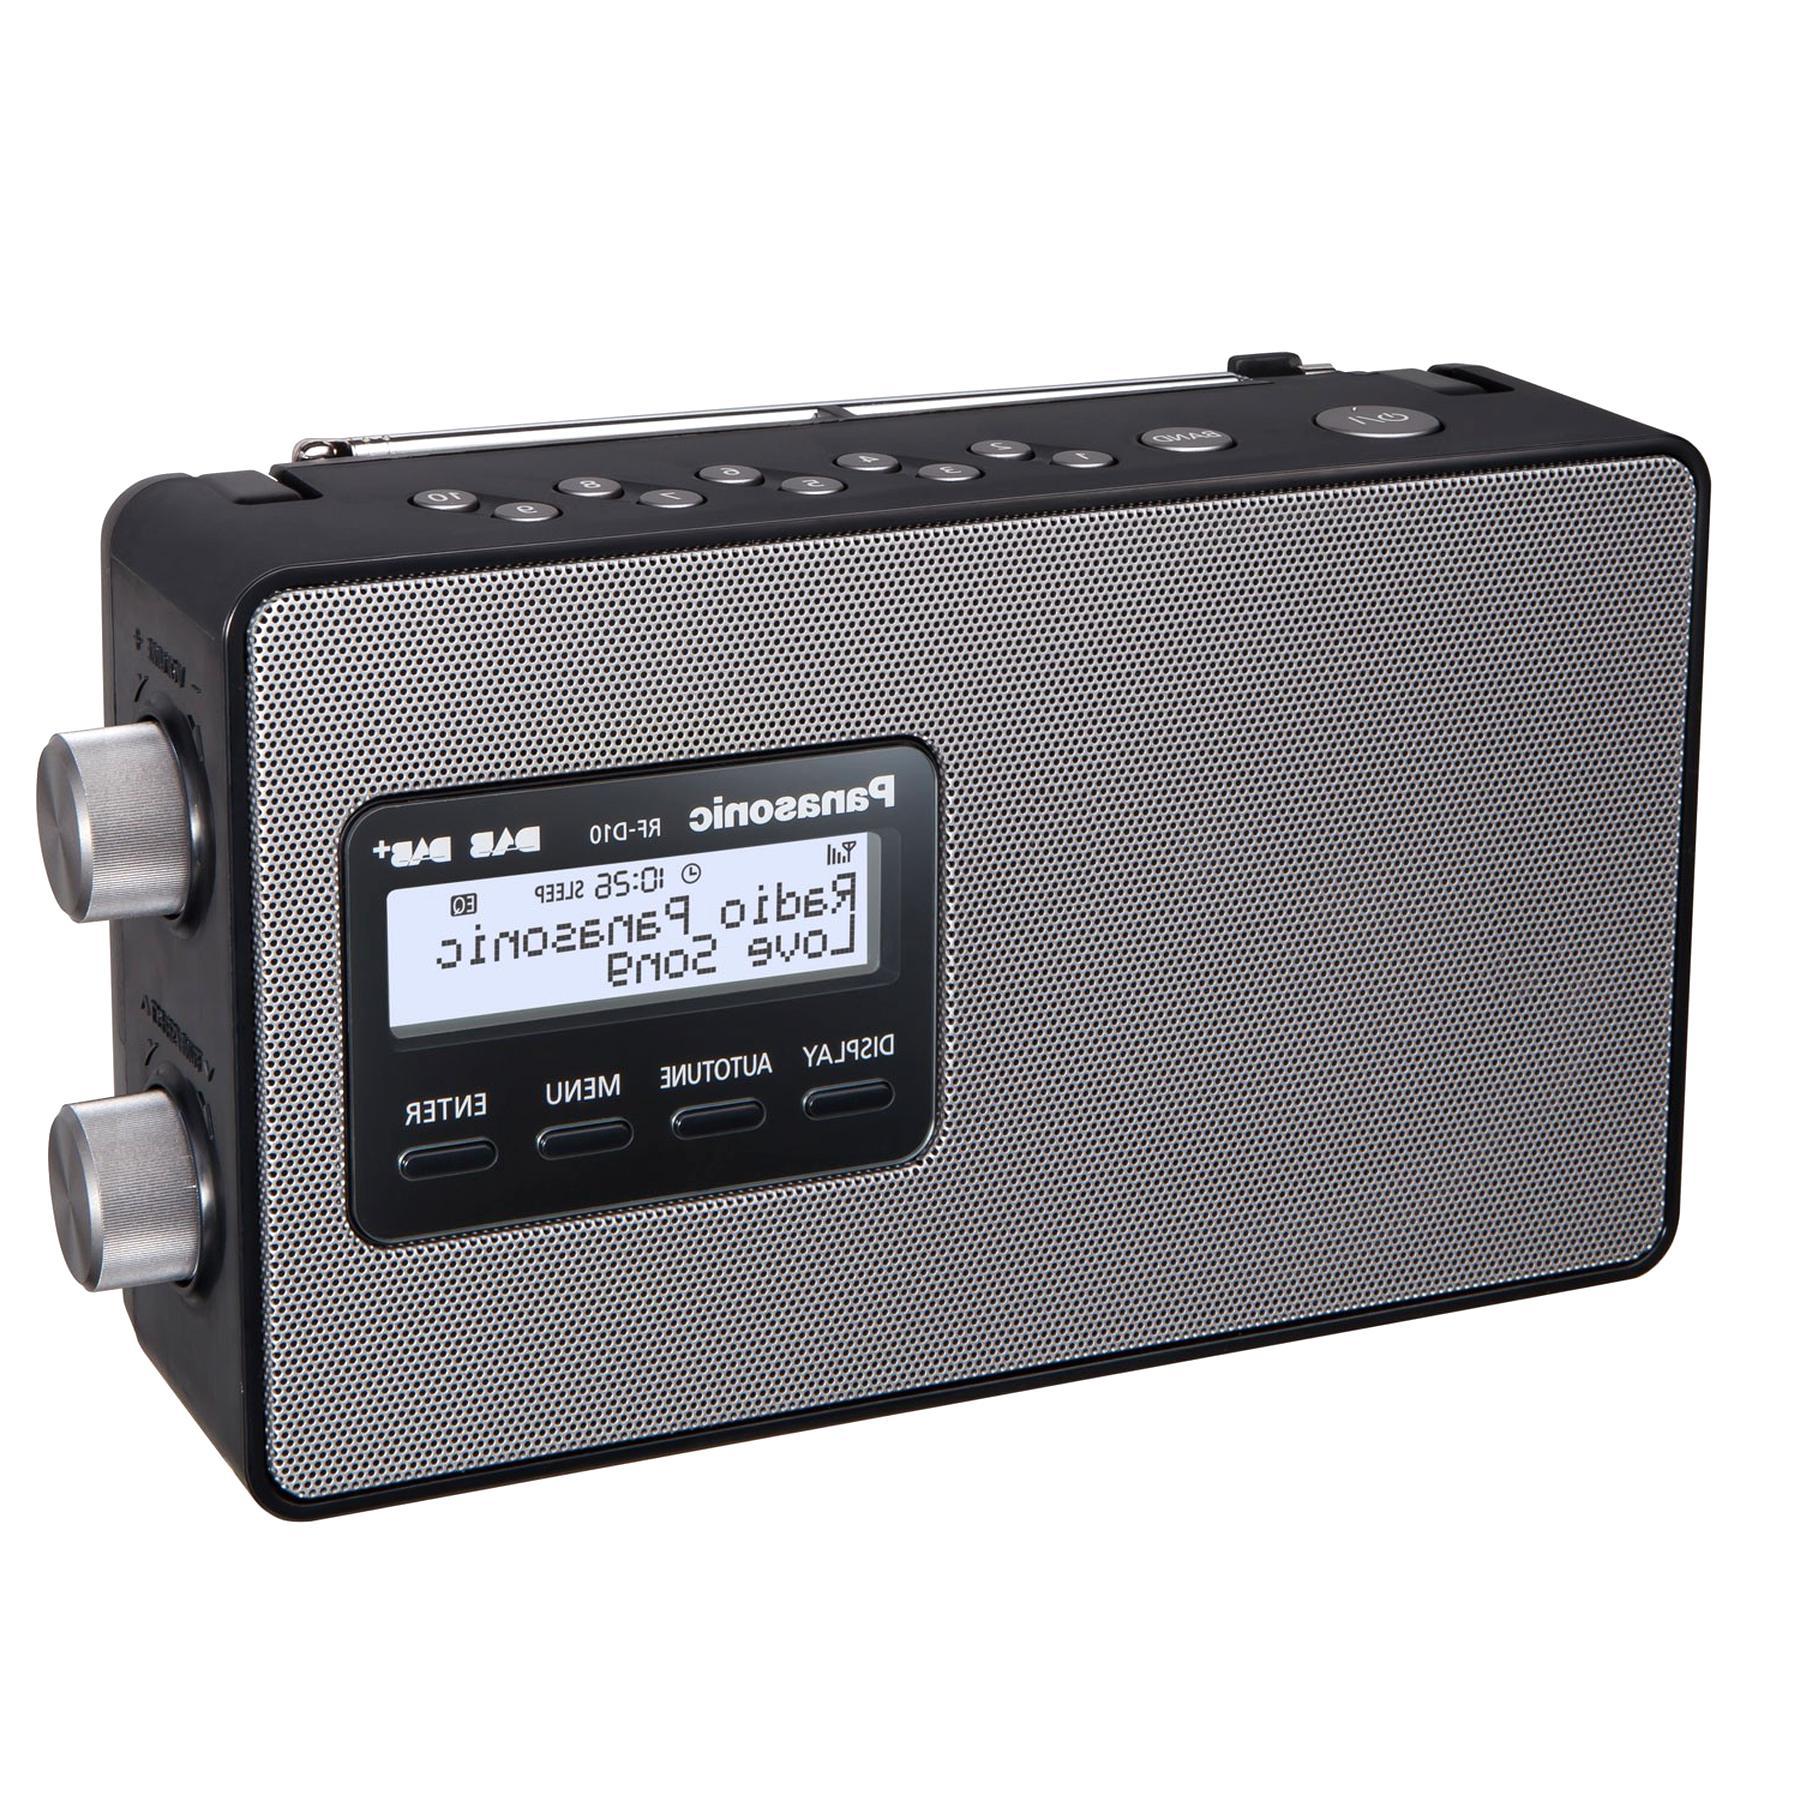 panasonic dab radio for sale